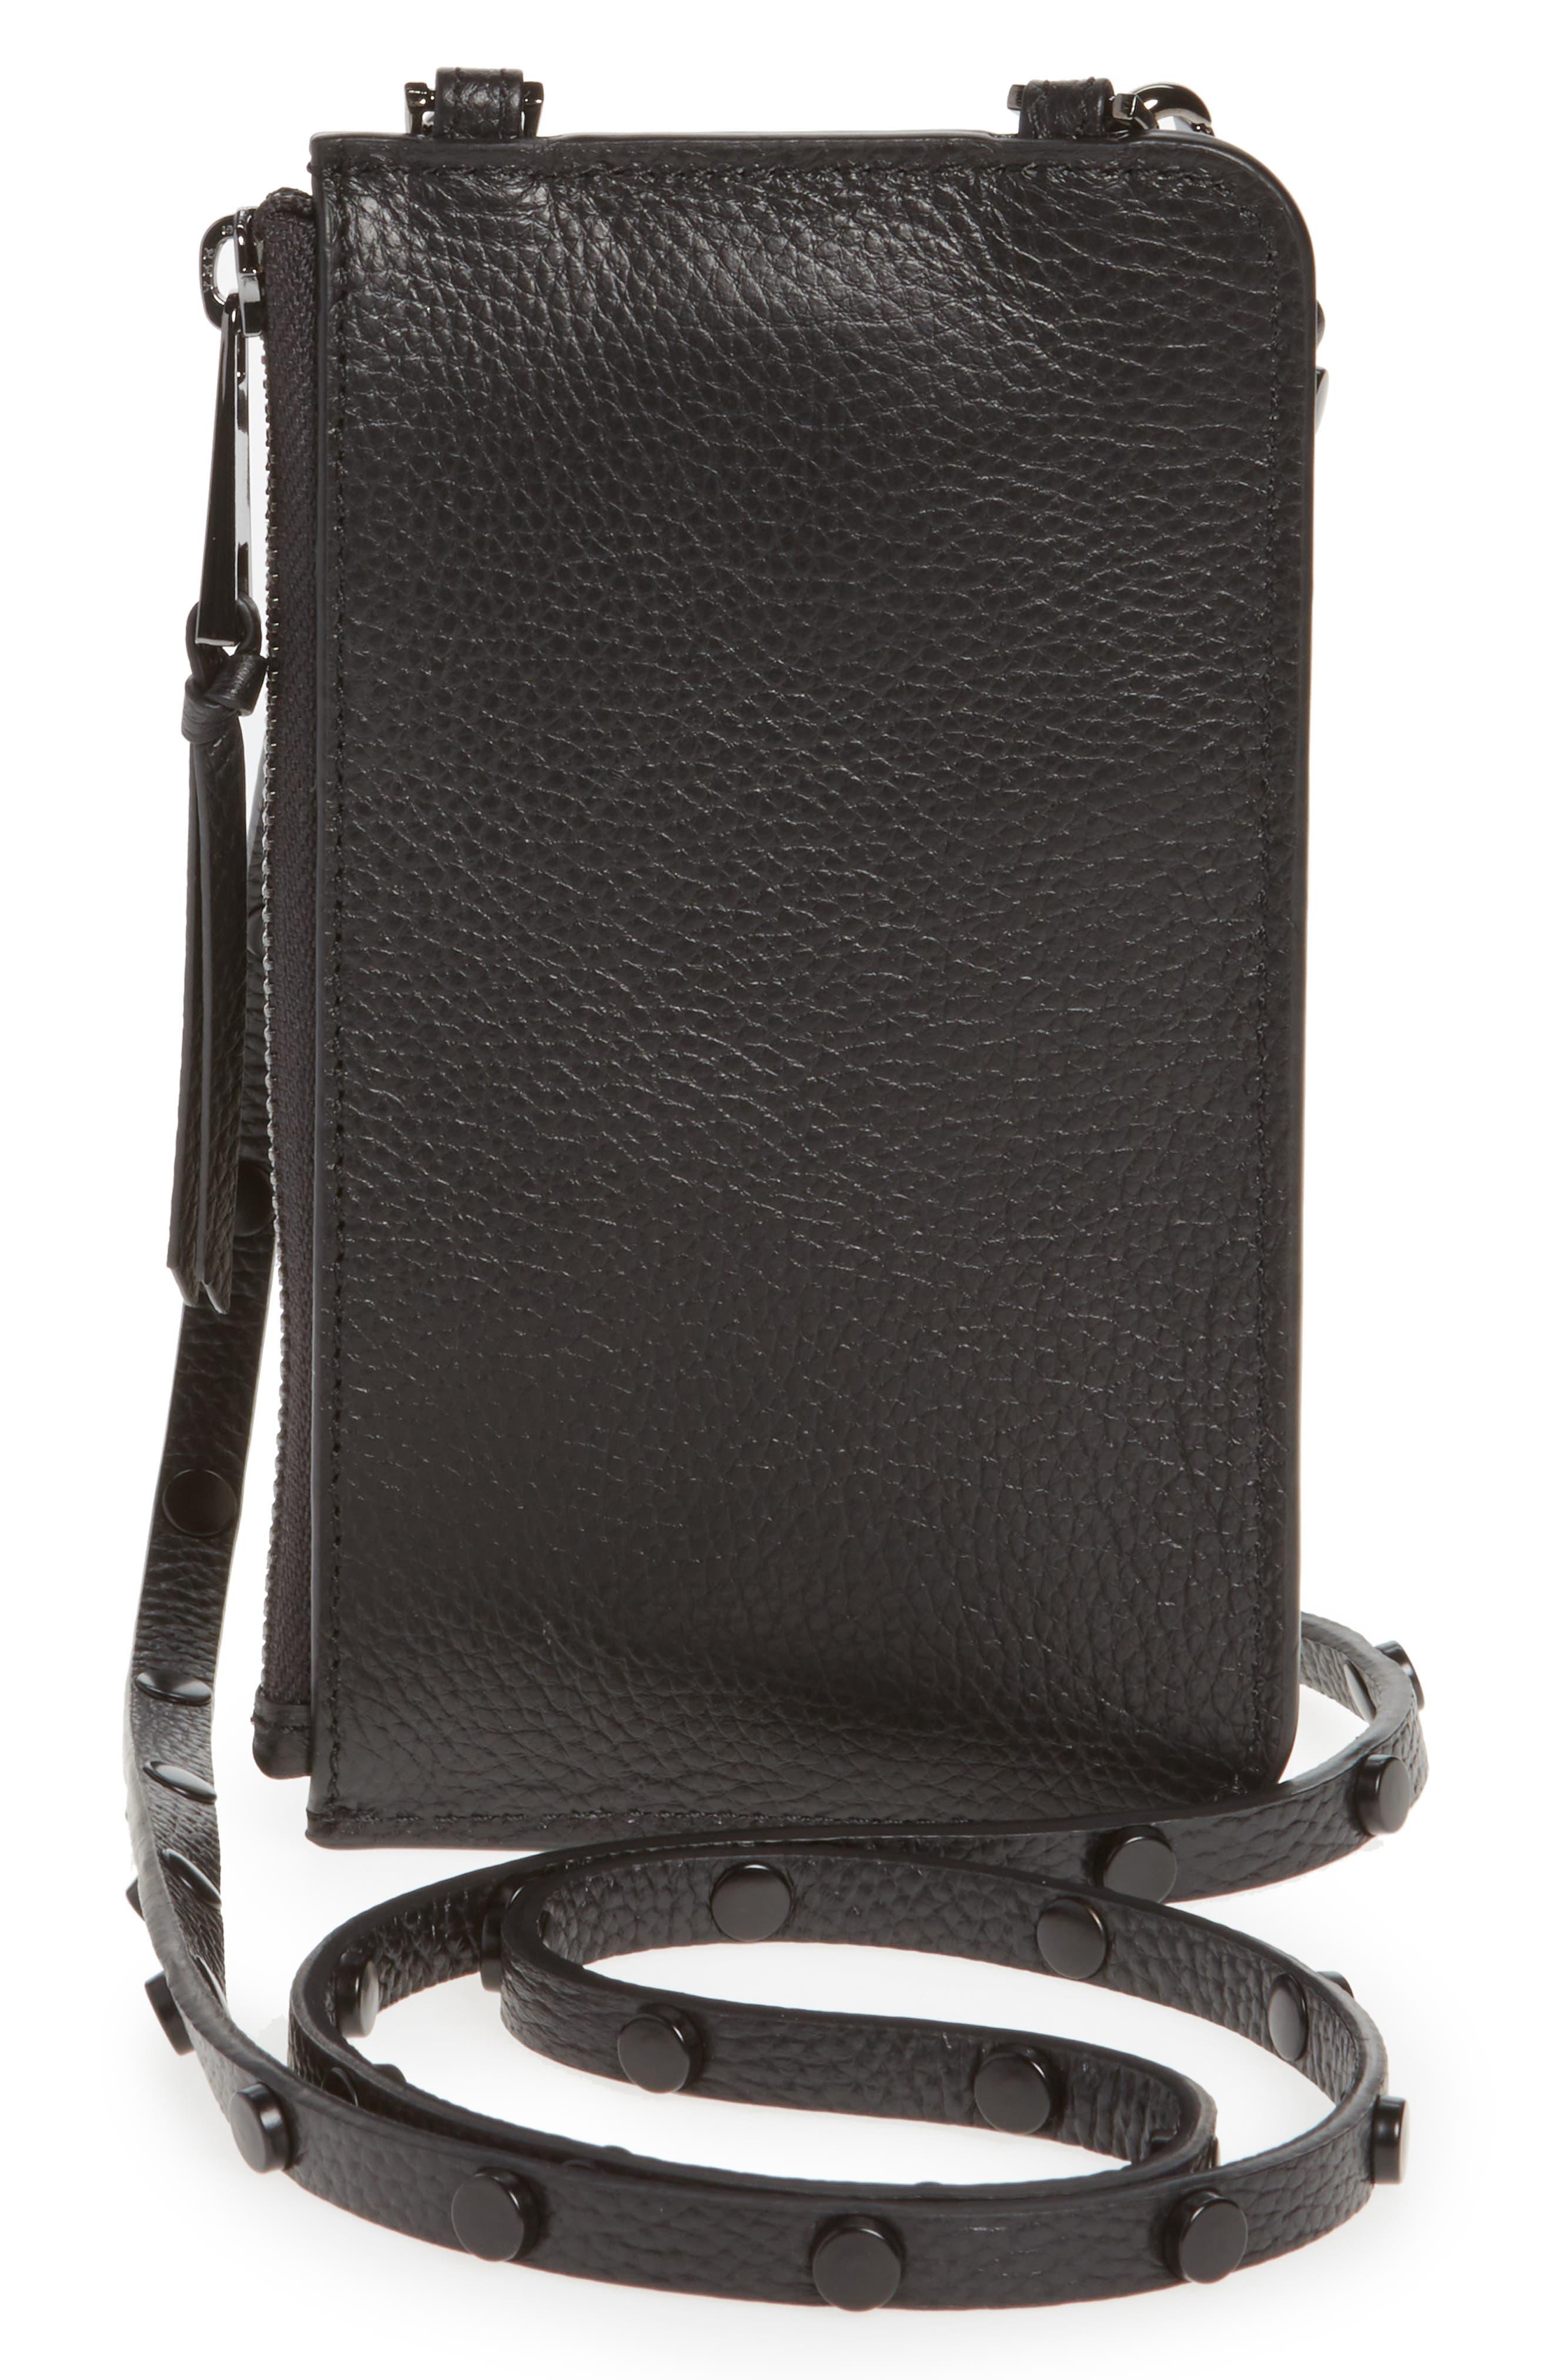 Jane Leather iPhone 7/8 & 7/8 Plus Crossbody Case,                             Alternate thumbnail 5, color,                             BLACK/ PEWTER